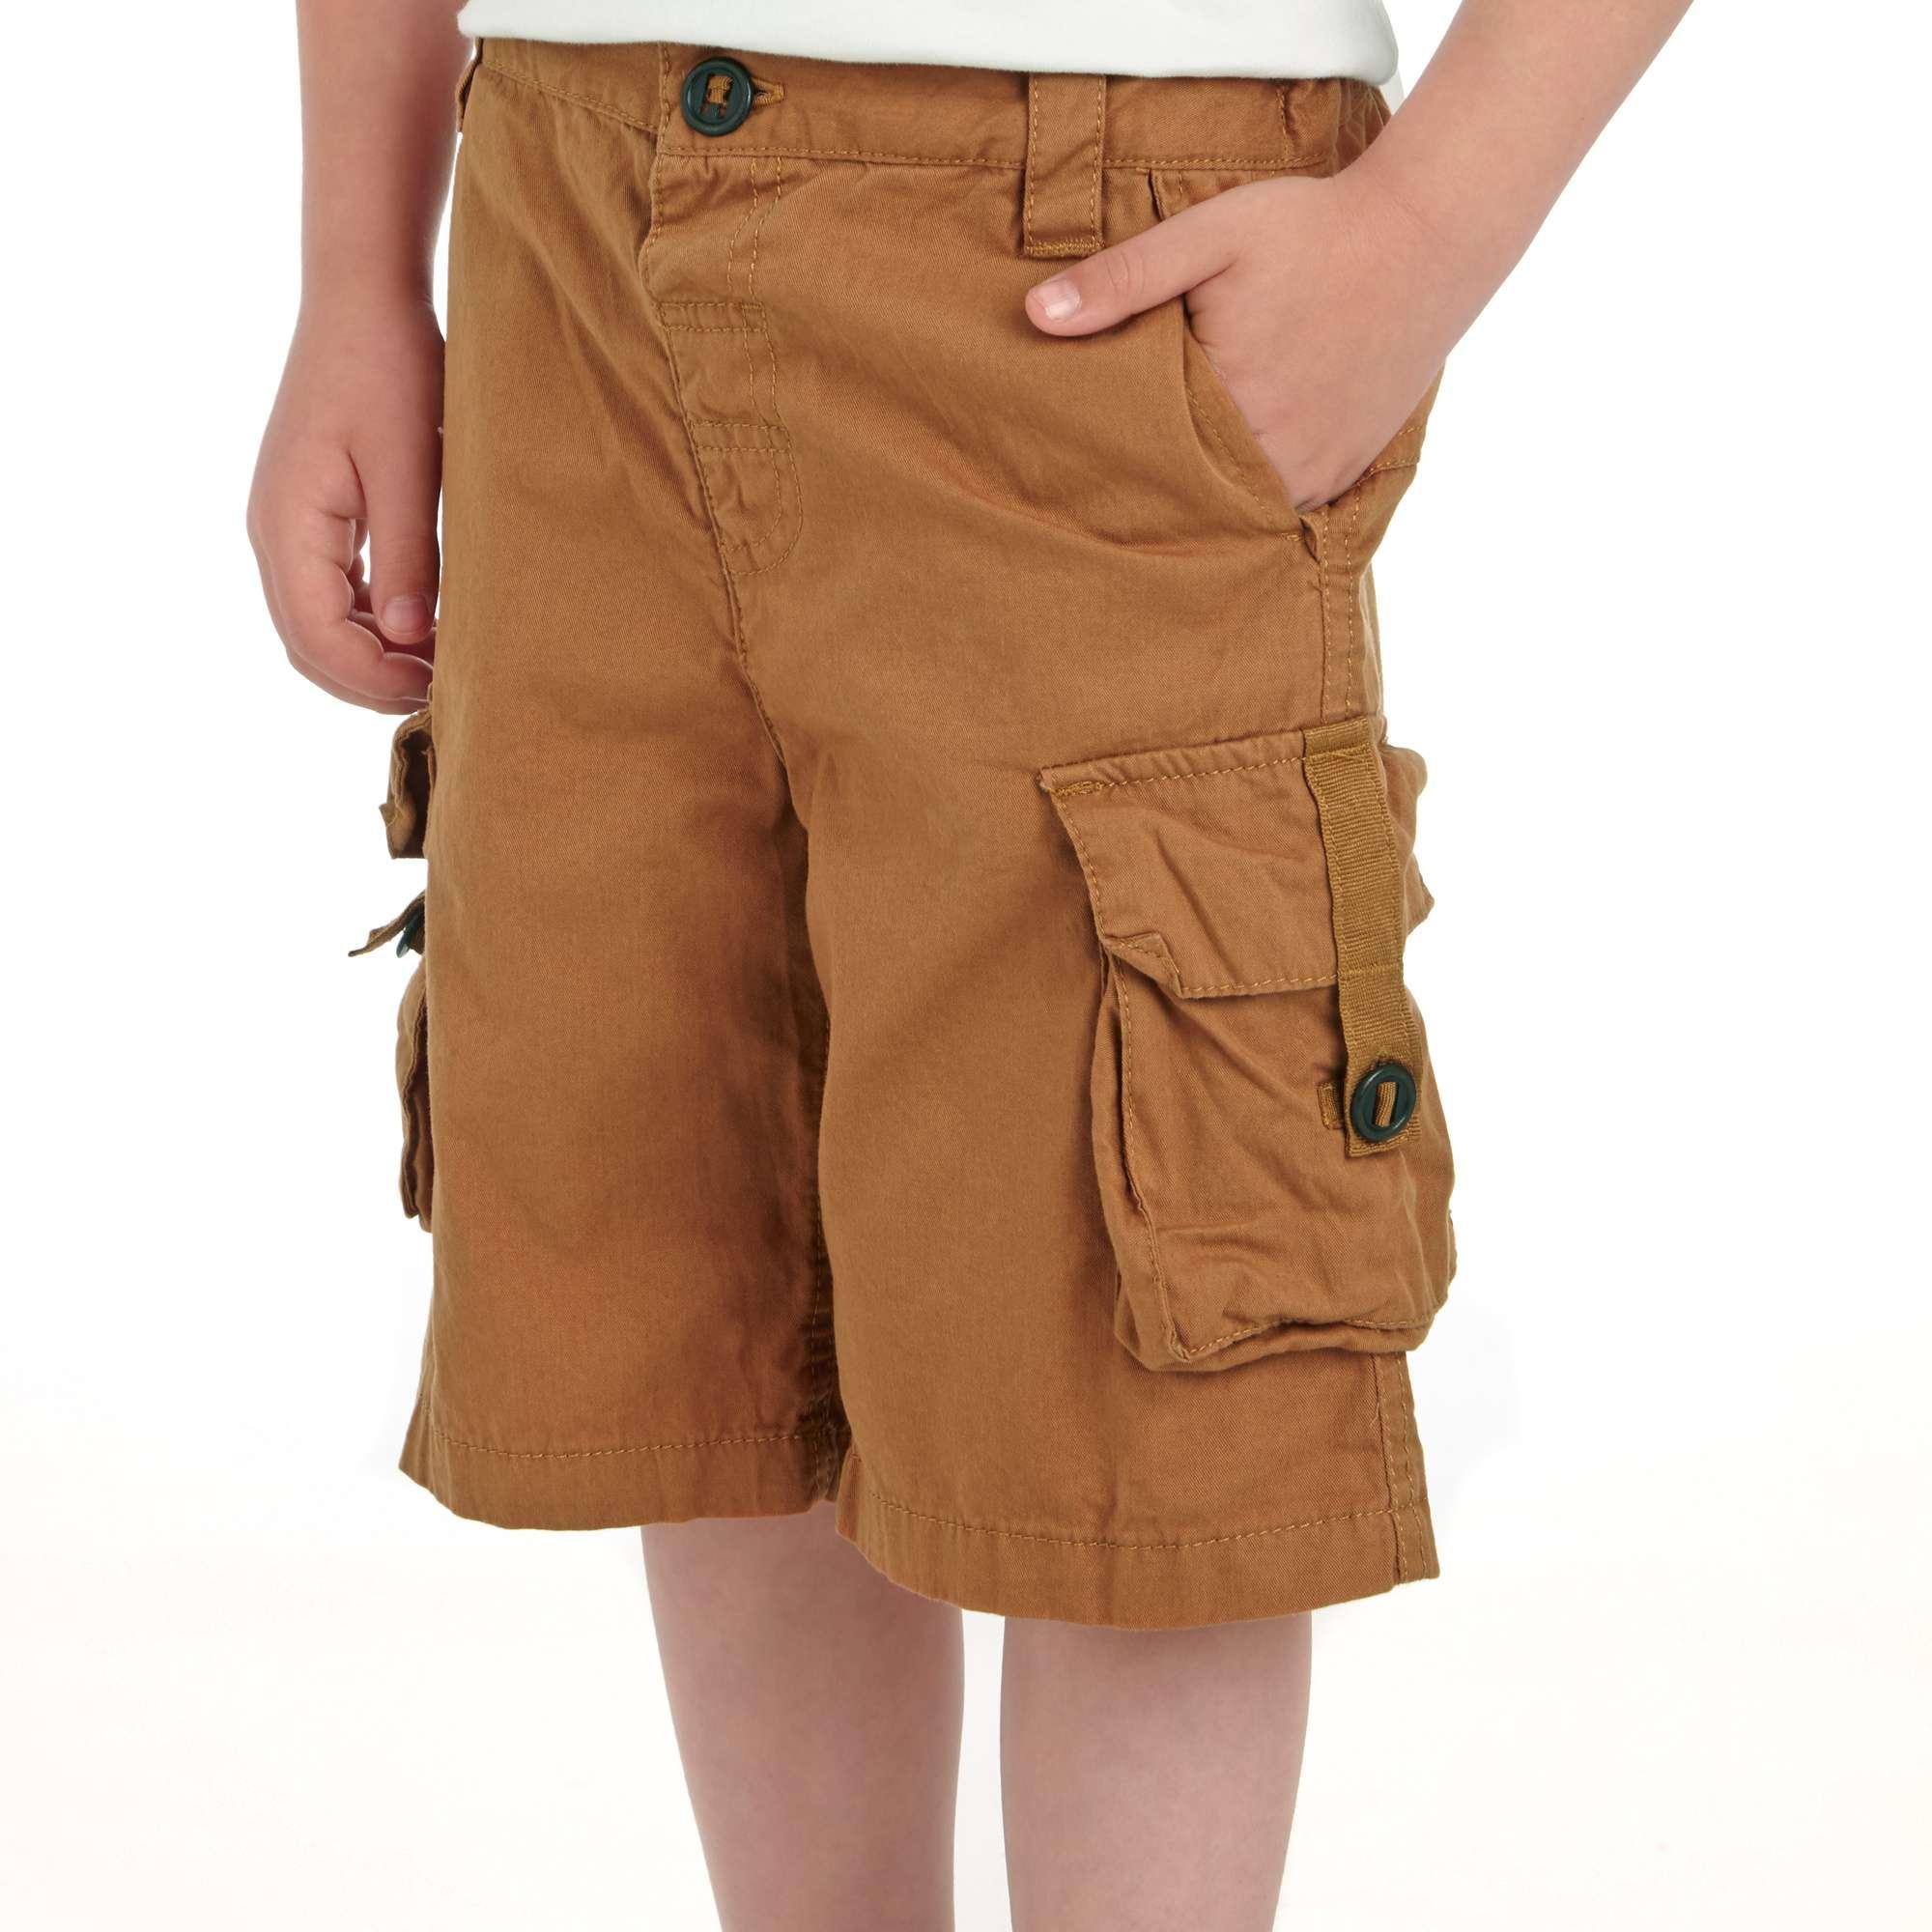 REGATTA Boys' Towson Shorts